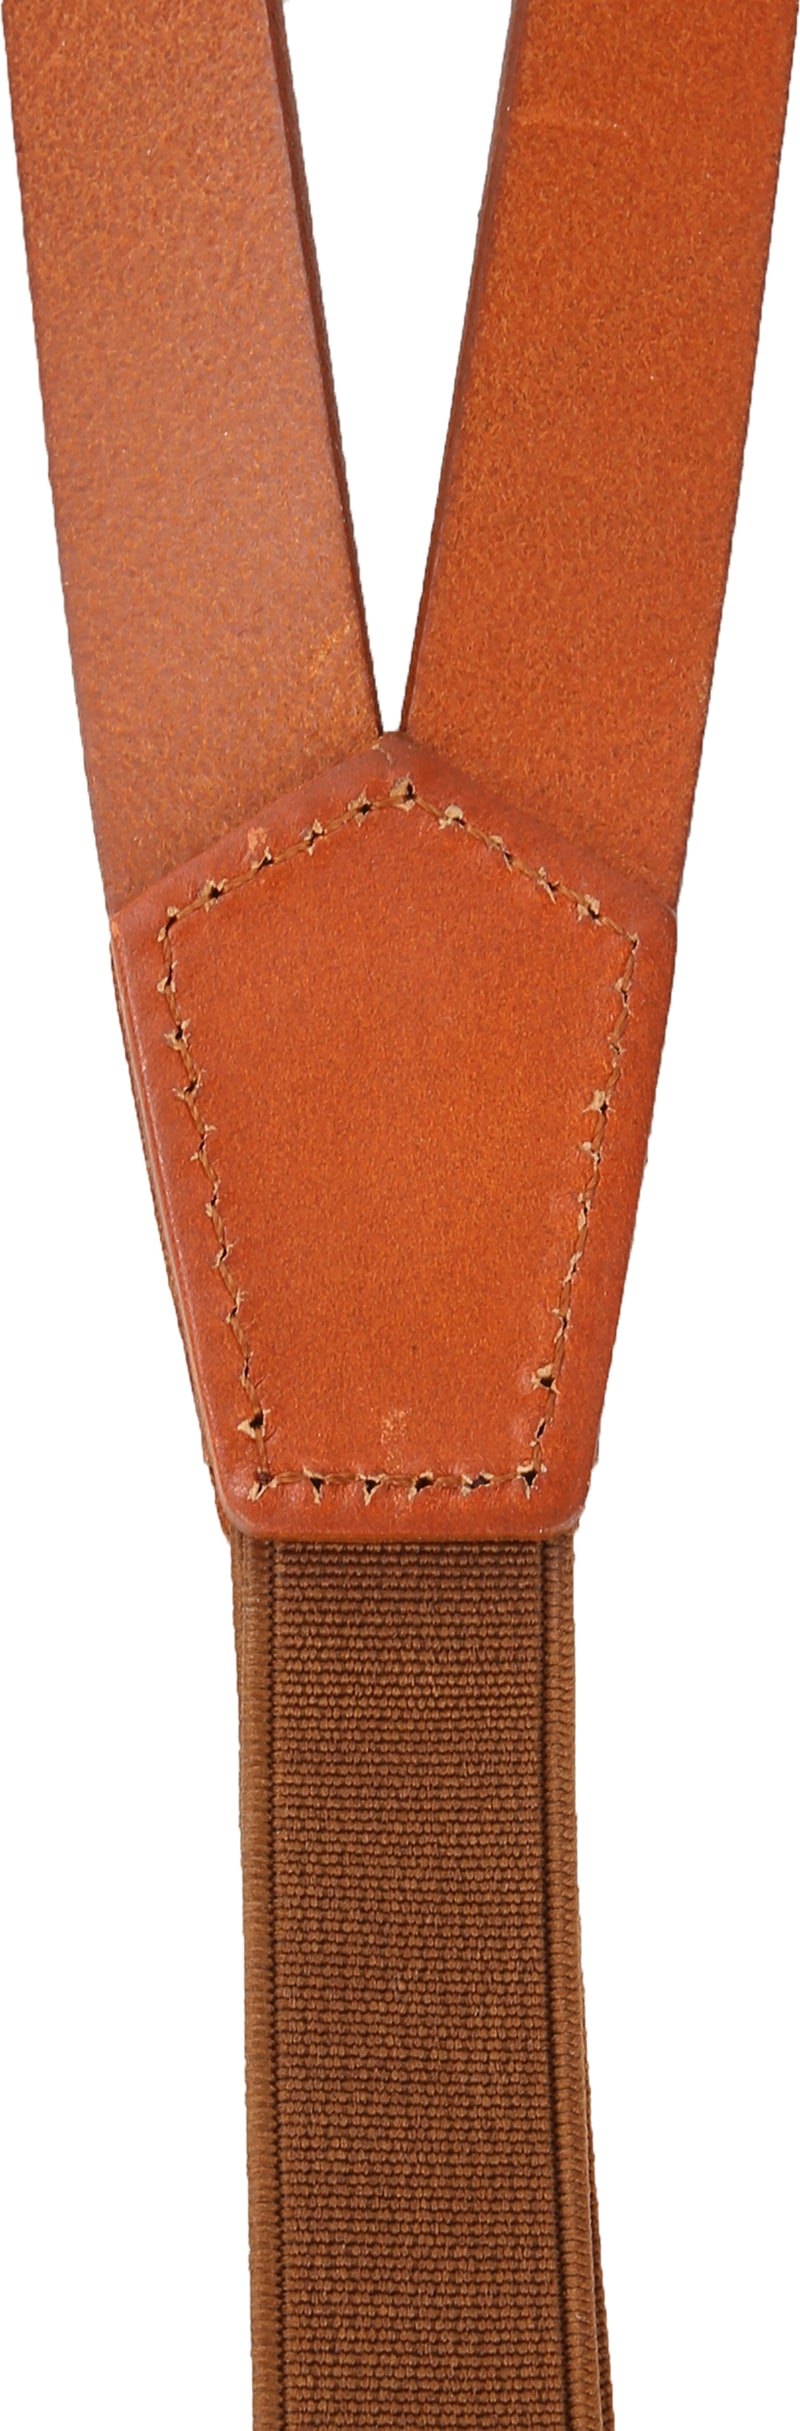 Suitable Suspenders Cognac Leather photo 2